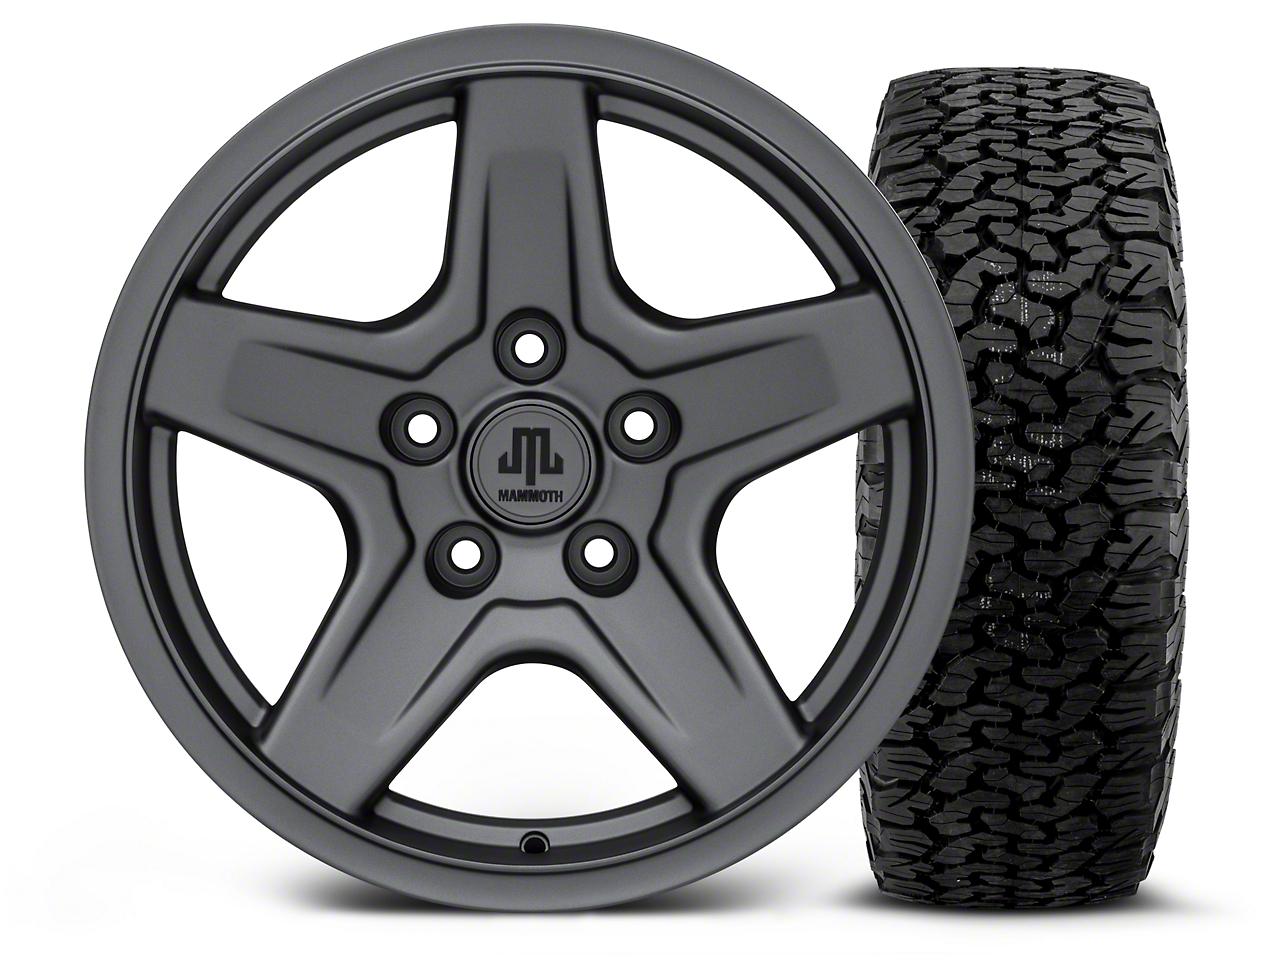 Mammoth Boulder Charcoal - 17x9 Wheel - and BF Goodrich All Terrain TA KO2 Tire - 315/70R17 (07-18 Jeep Wrangler JK; 2018 Jeep Wrangler JL)